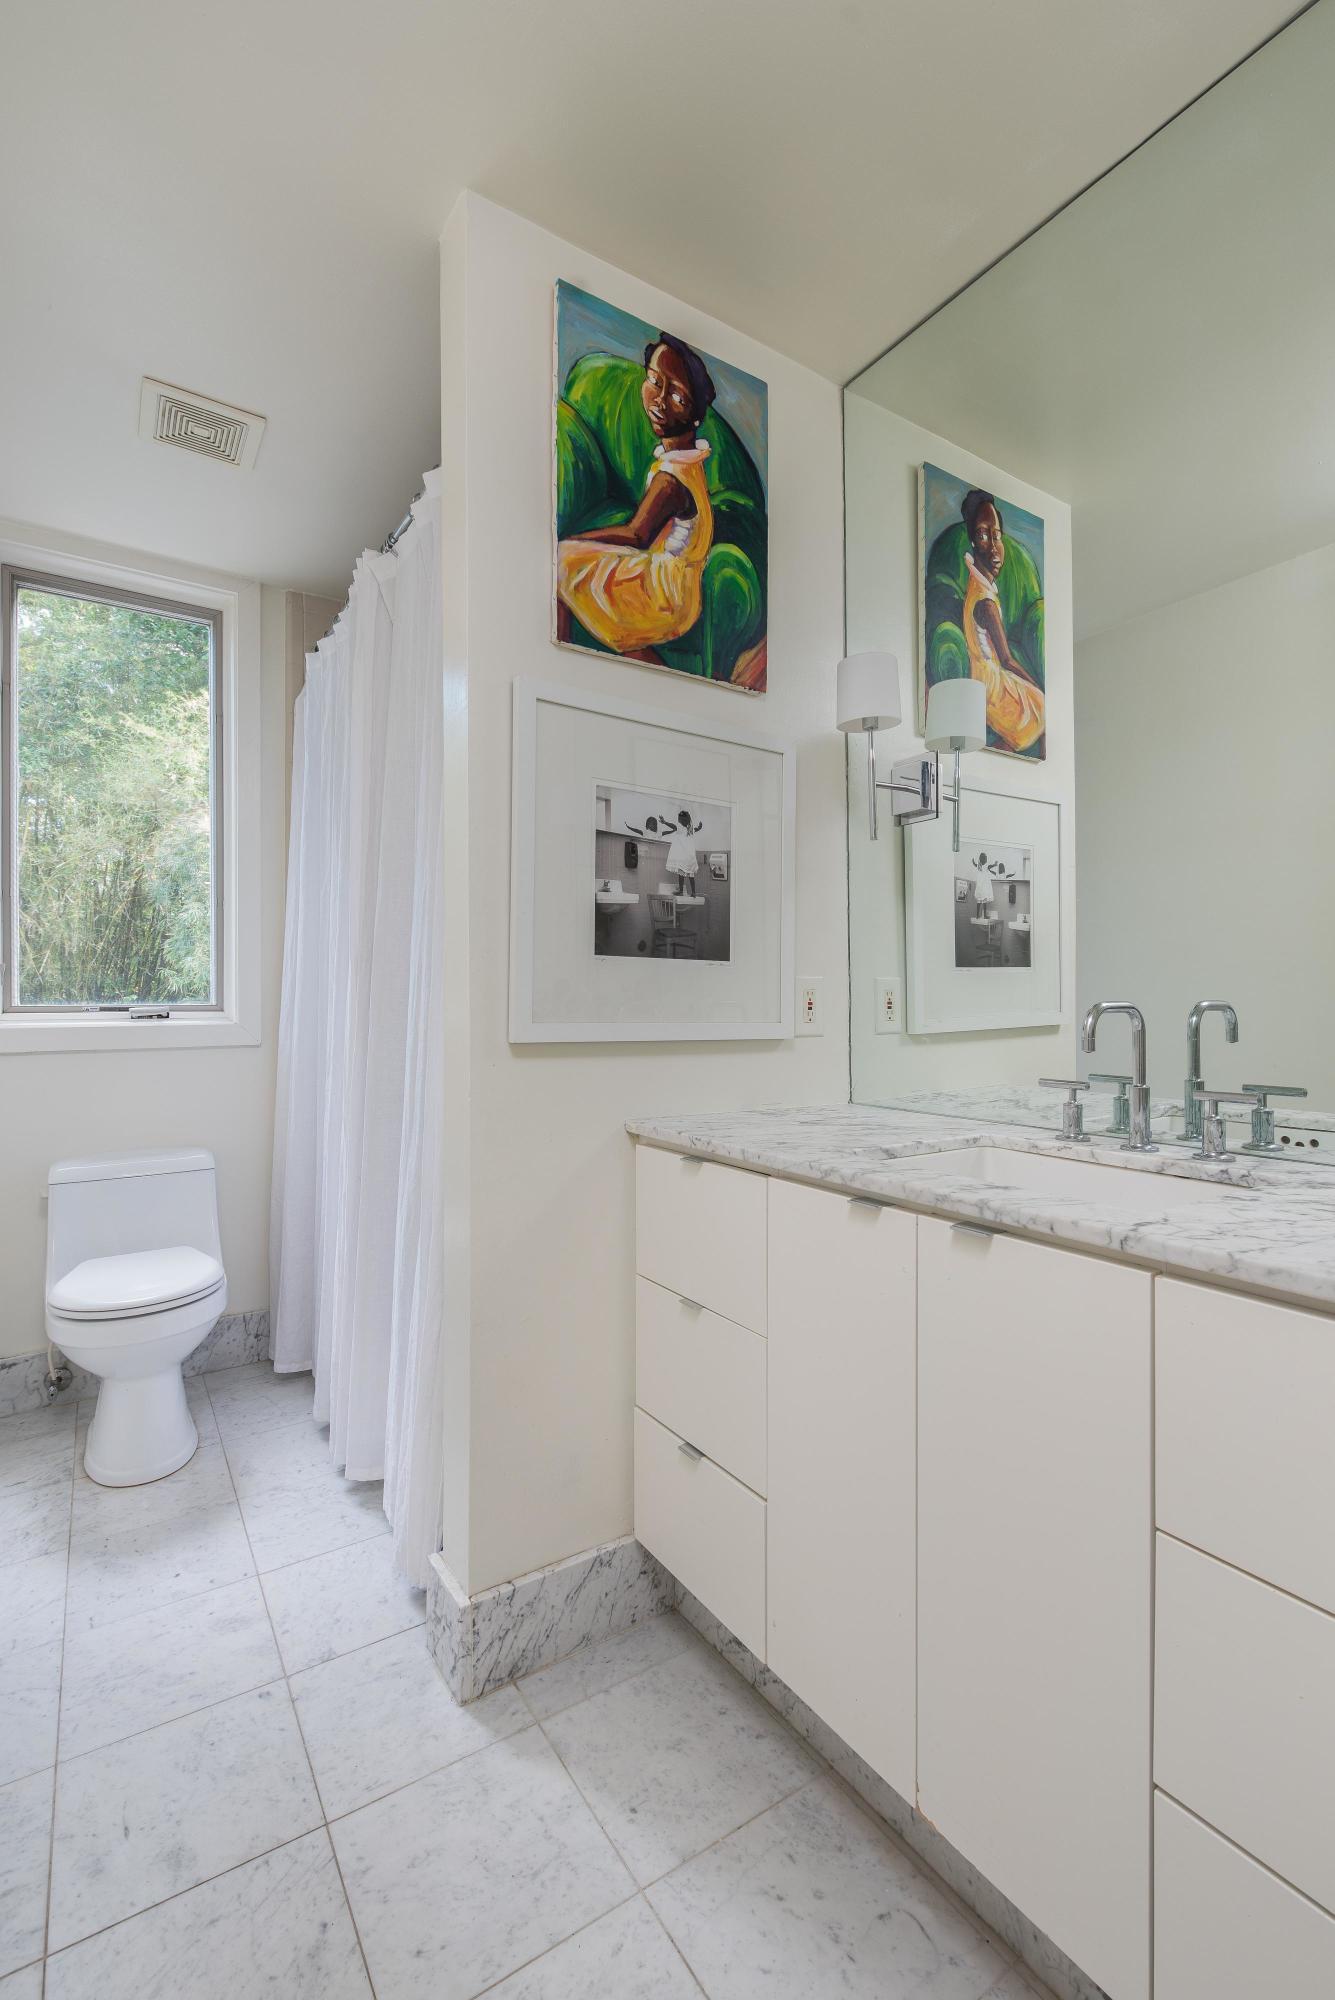 Riverland Terrace Homes For Sale - 2037 Lakeshore, Charleston, SC - 8